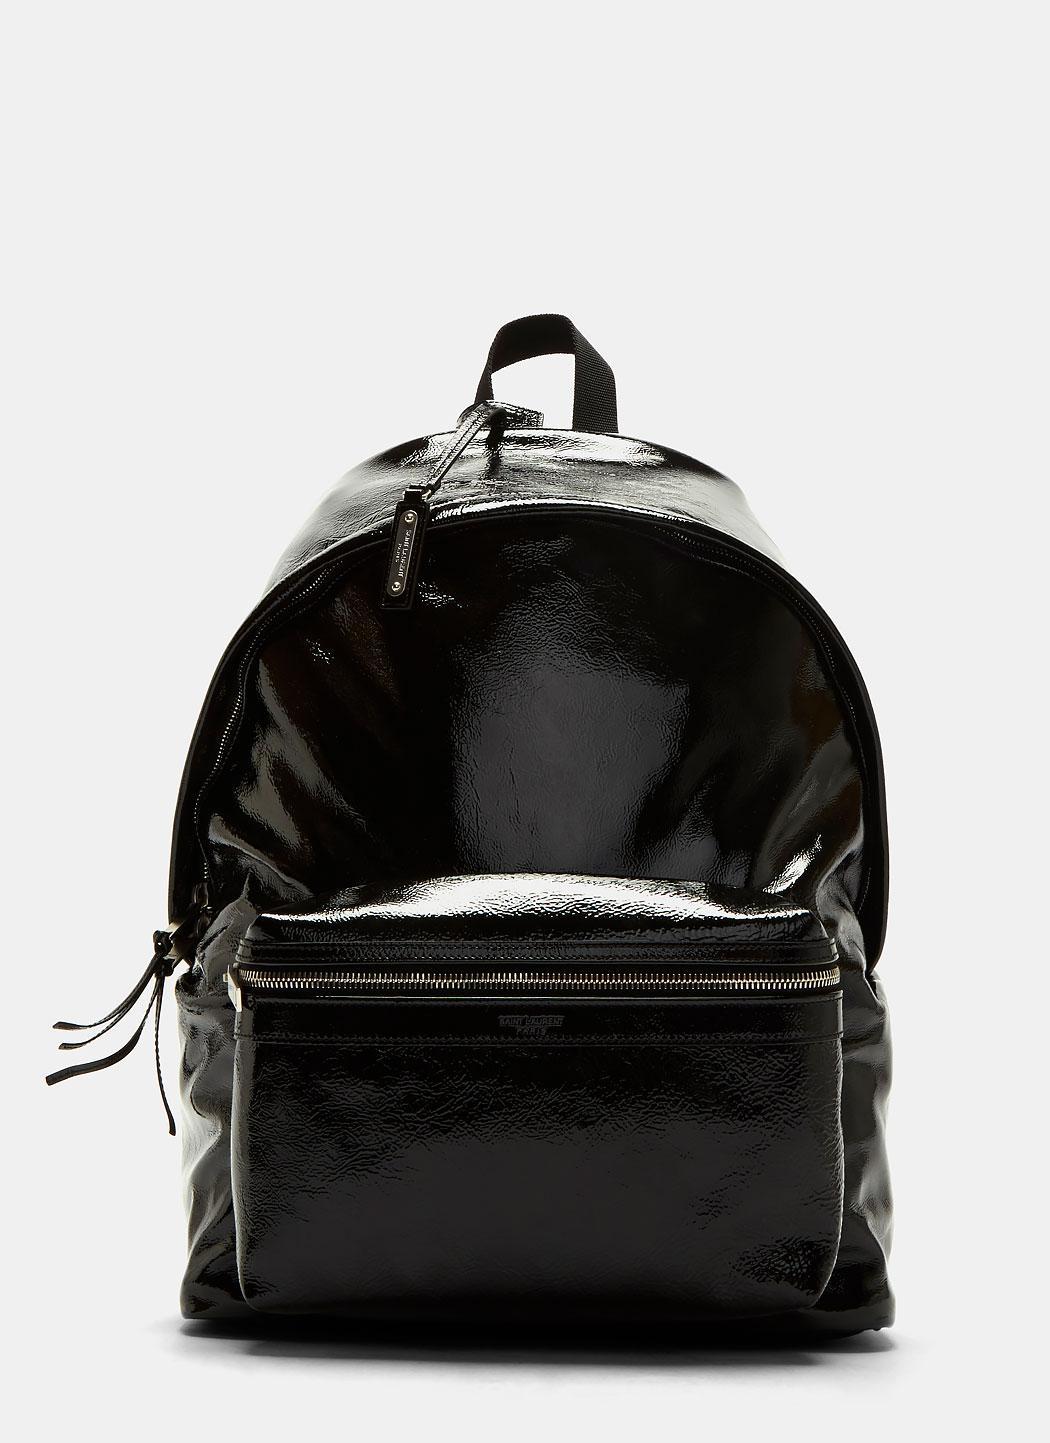 7a11935fd7f5 Saint Laurent Backpack Leather